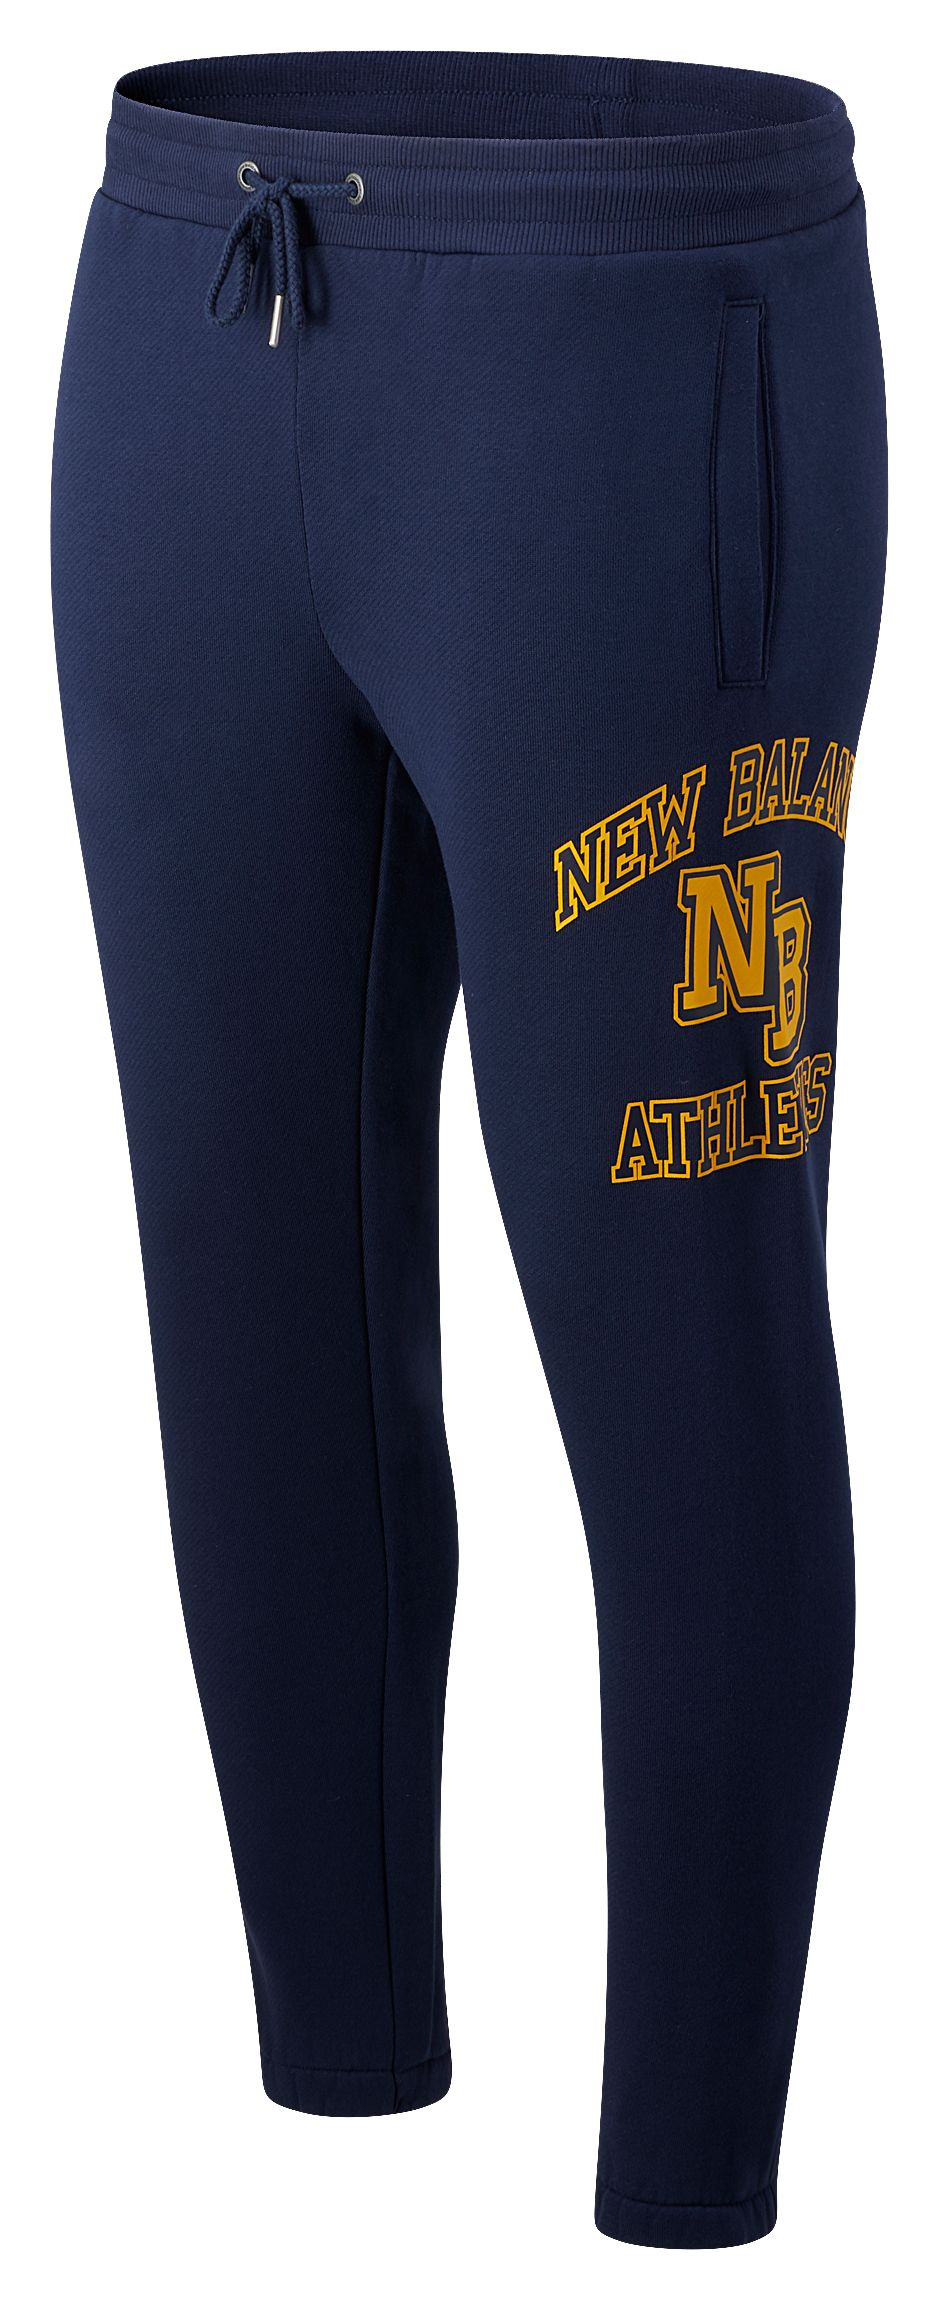 *Markdown*  Men's NB Athletics Varsity Pack Sweatpant